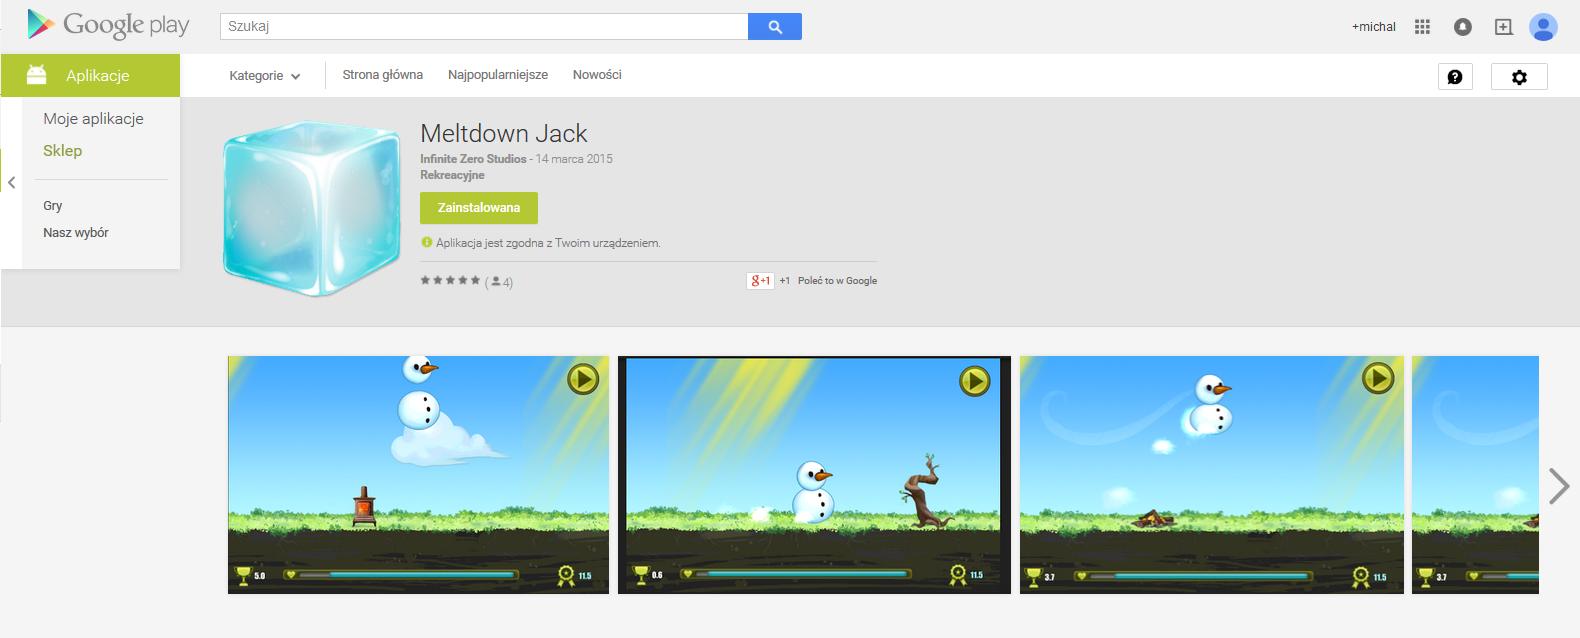 Meltdown Jack